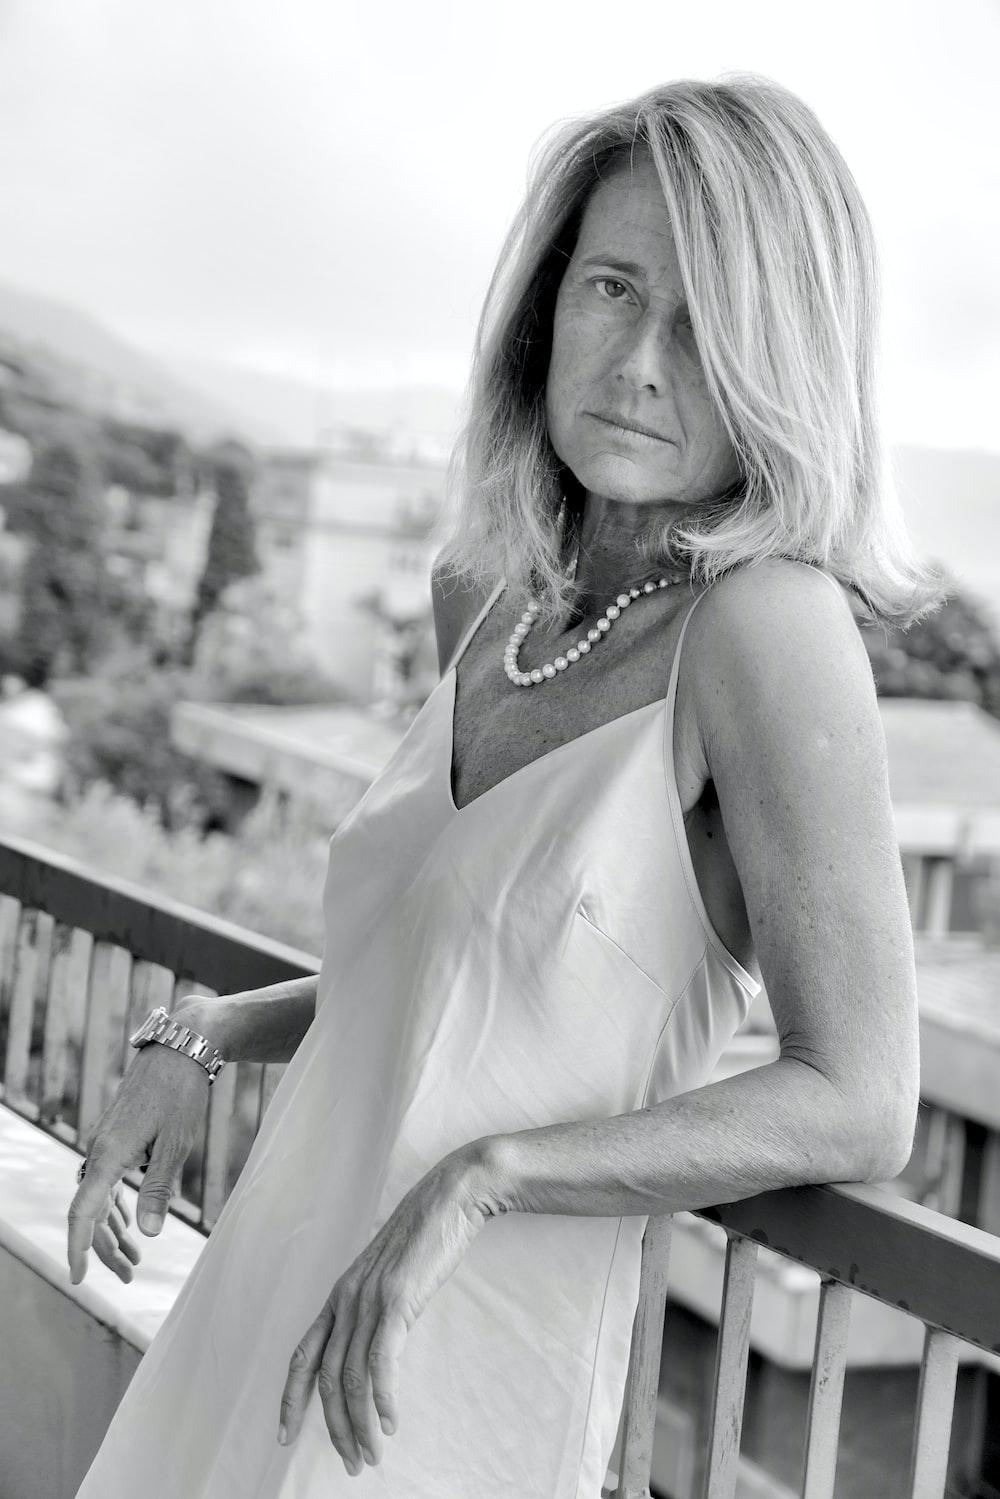 woman in white spaghetti strap dress